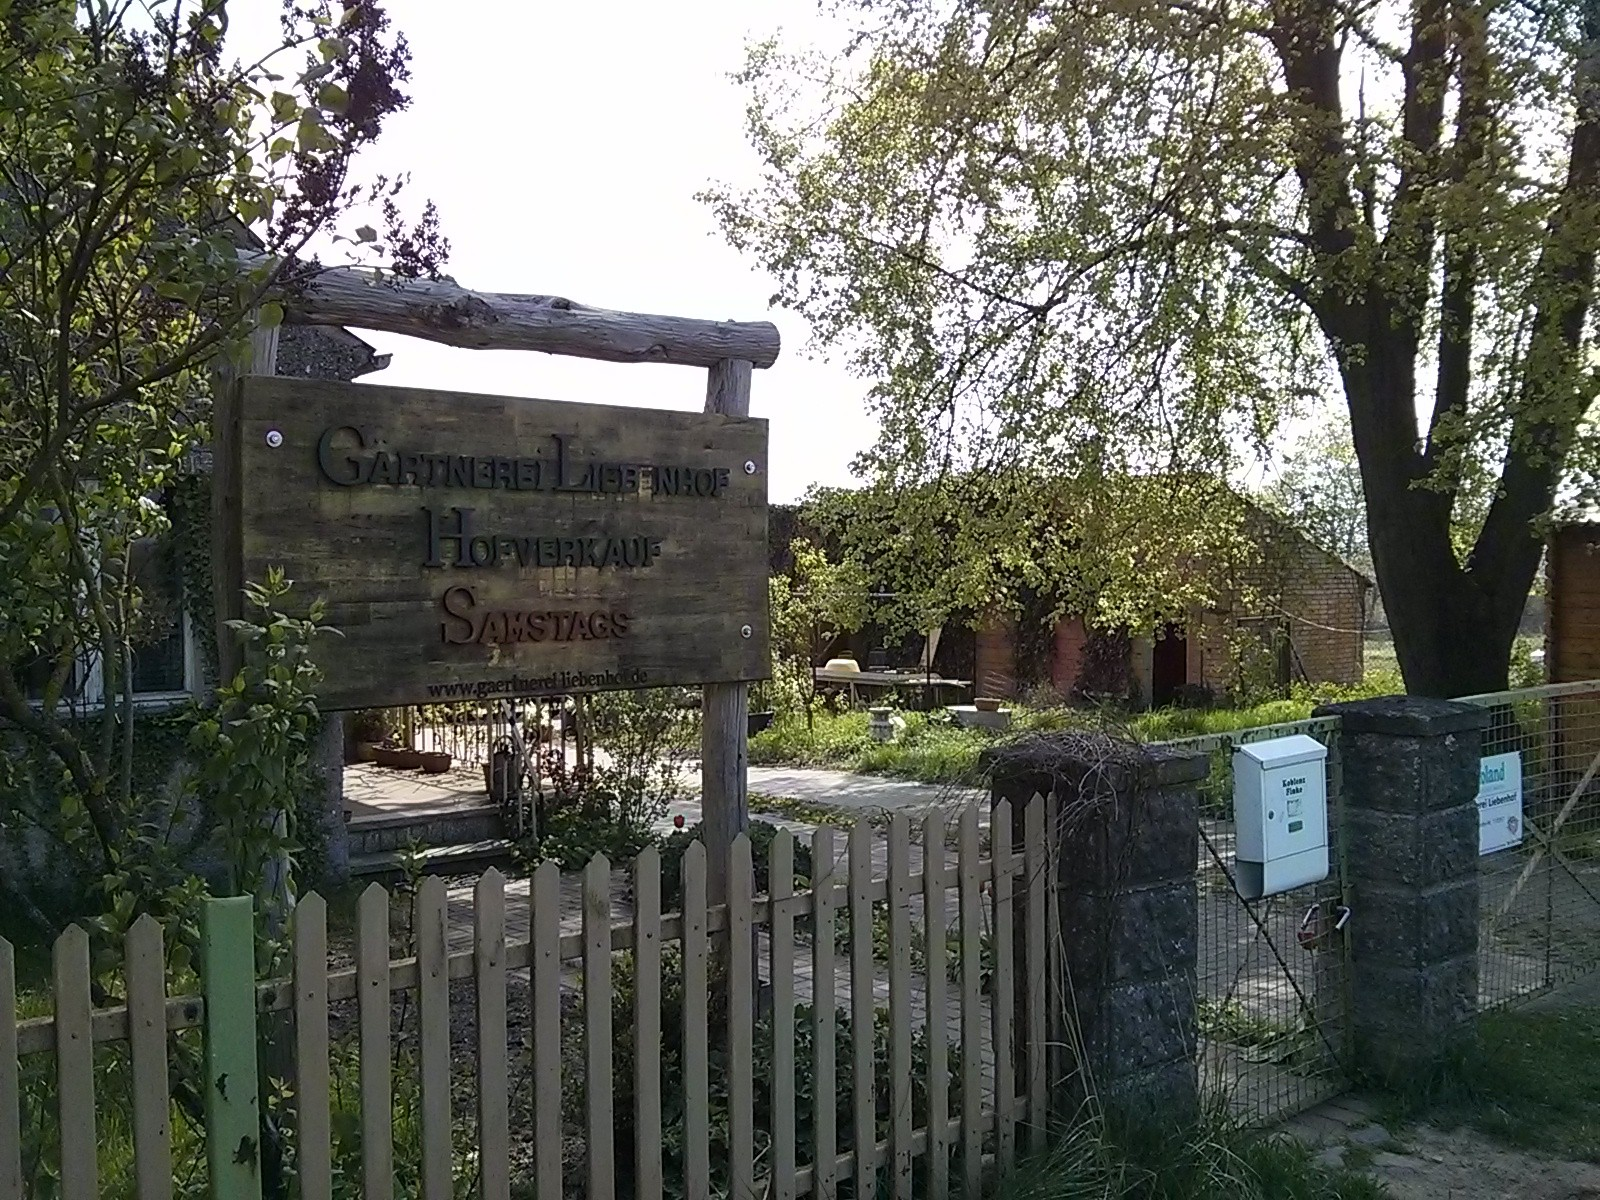 Gärtnerei Liebenhof